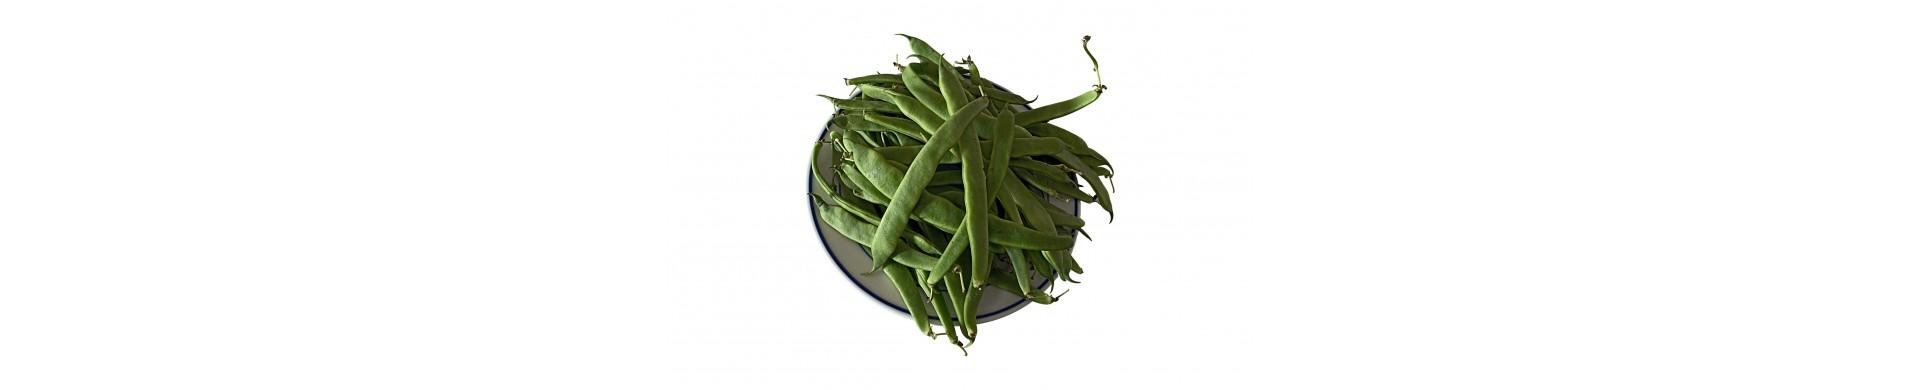 Jewish Plants - Buy Jewish Plant